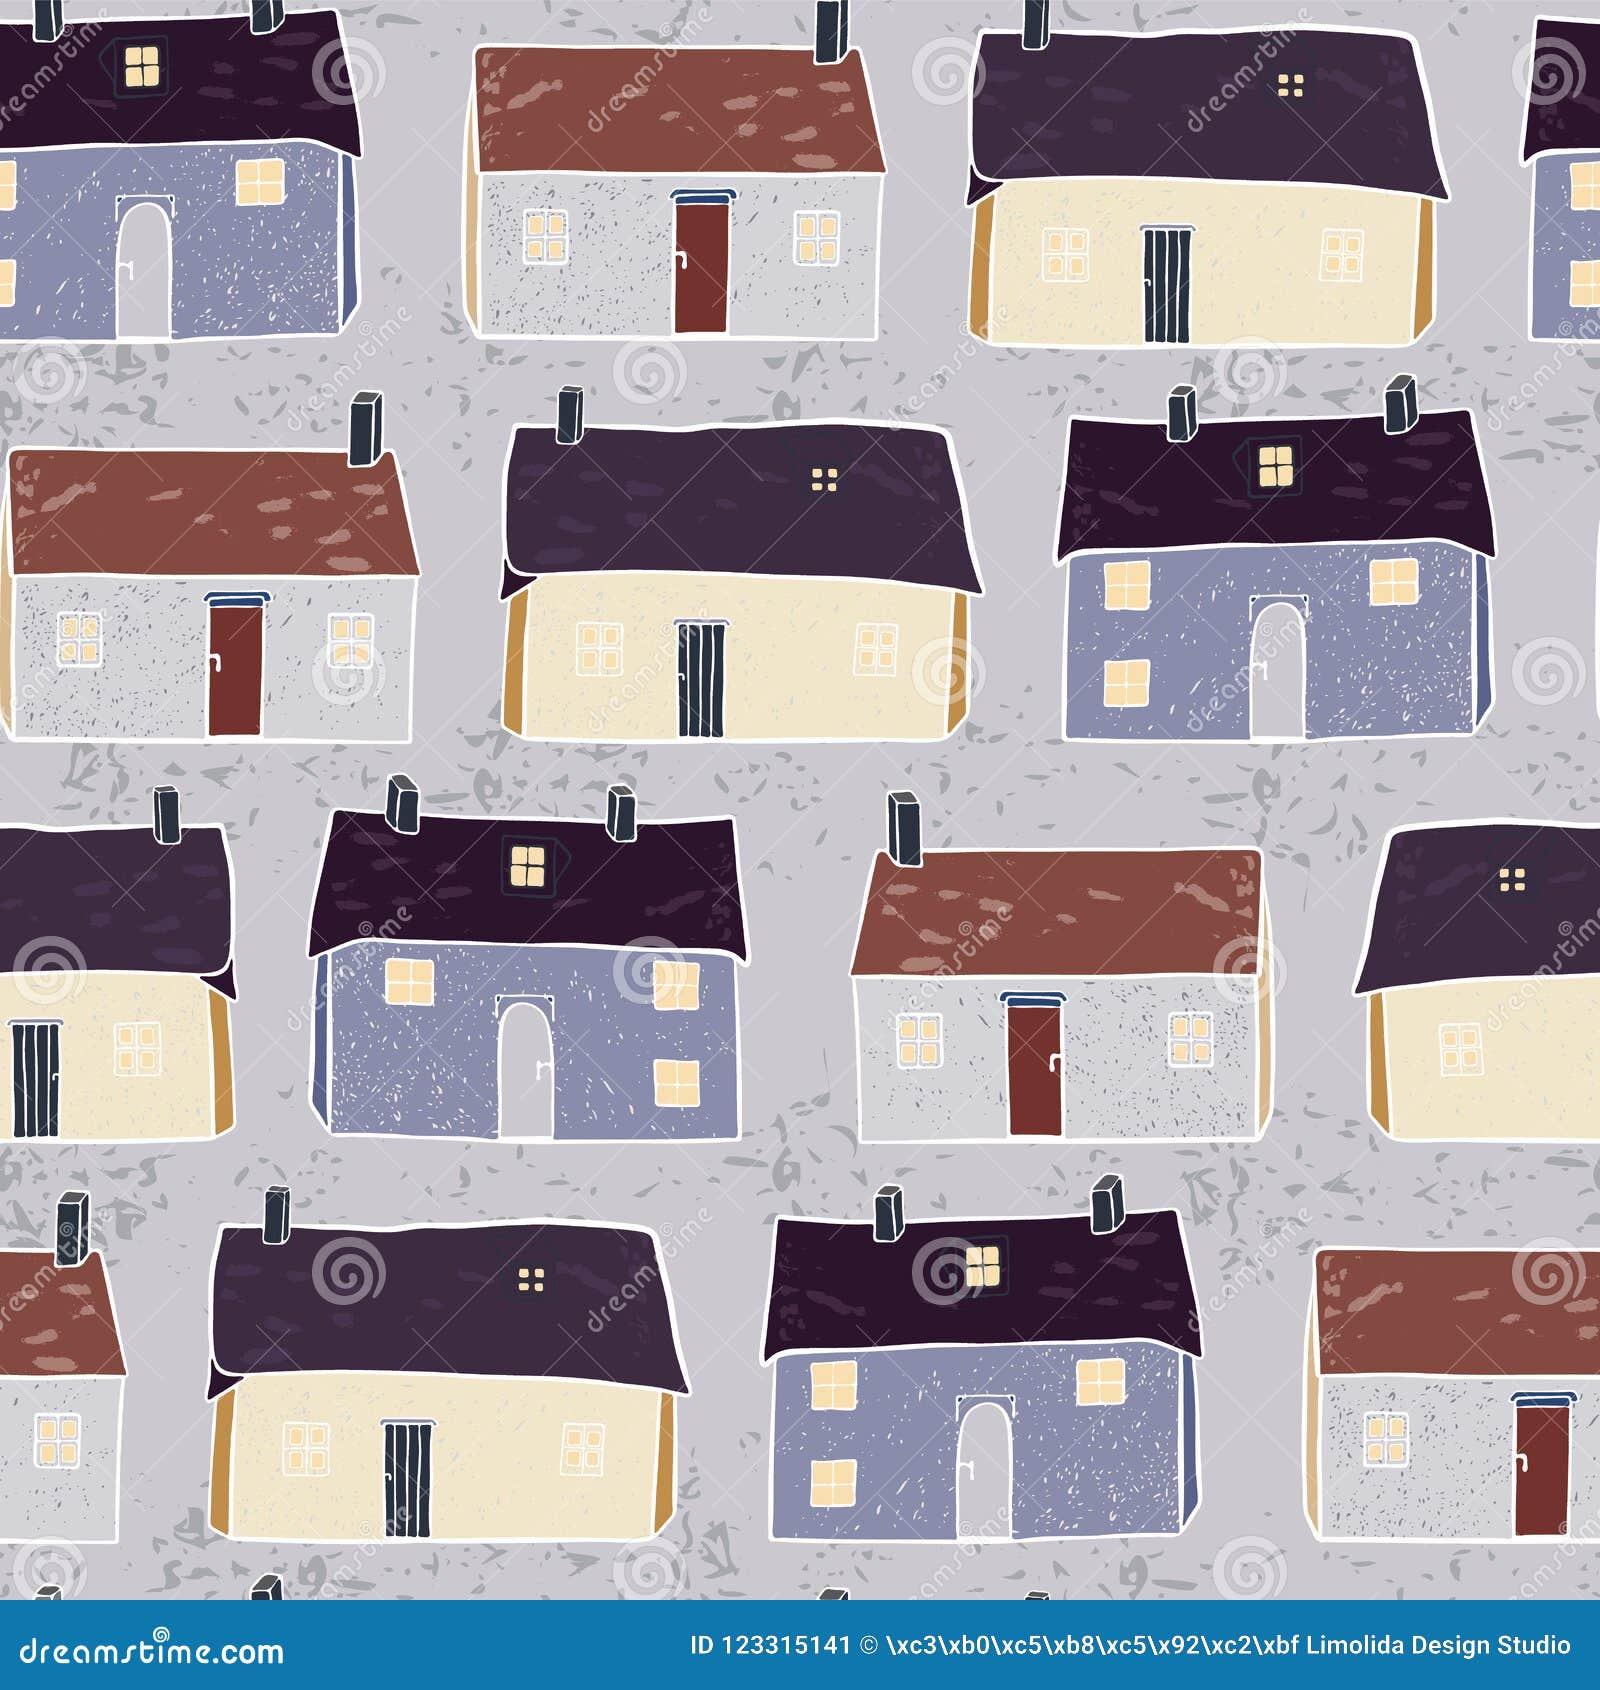 Houses Village Xmas Pattern Repeat Grey Brown